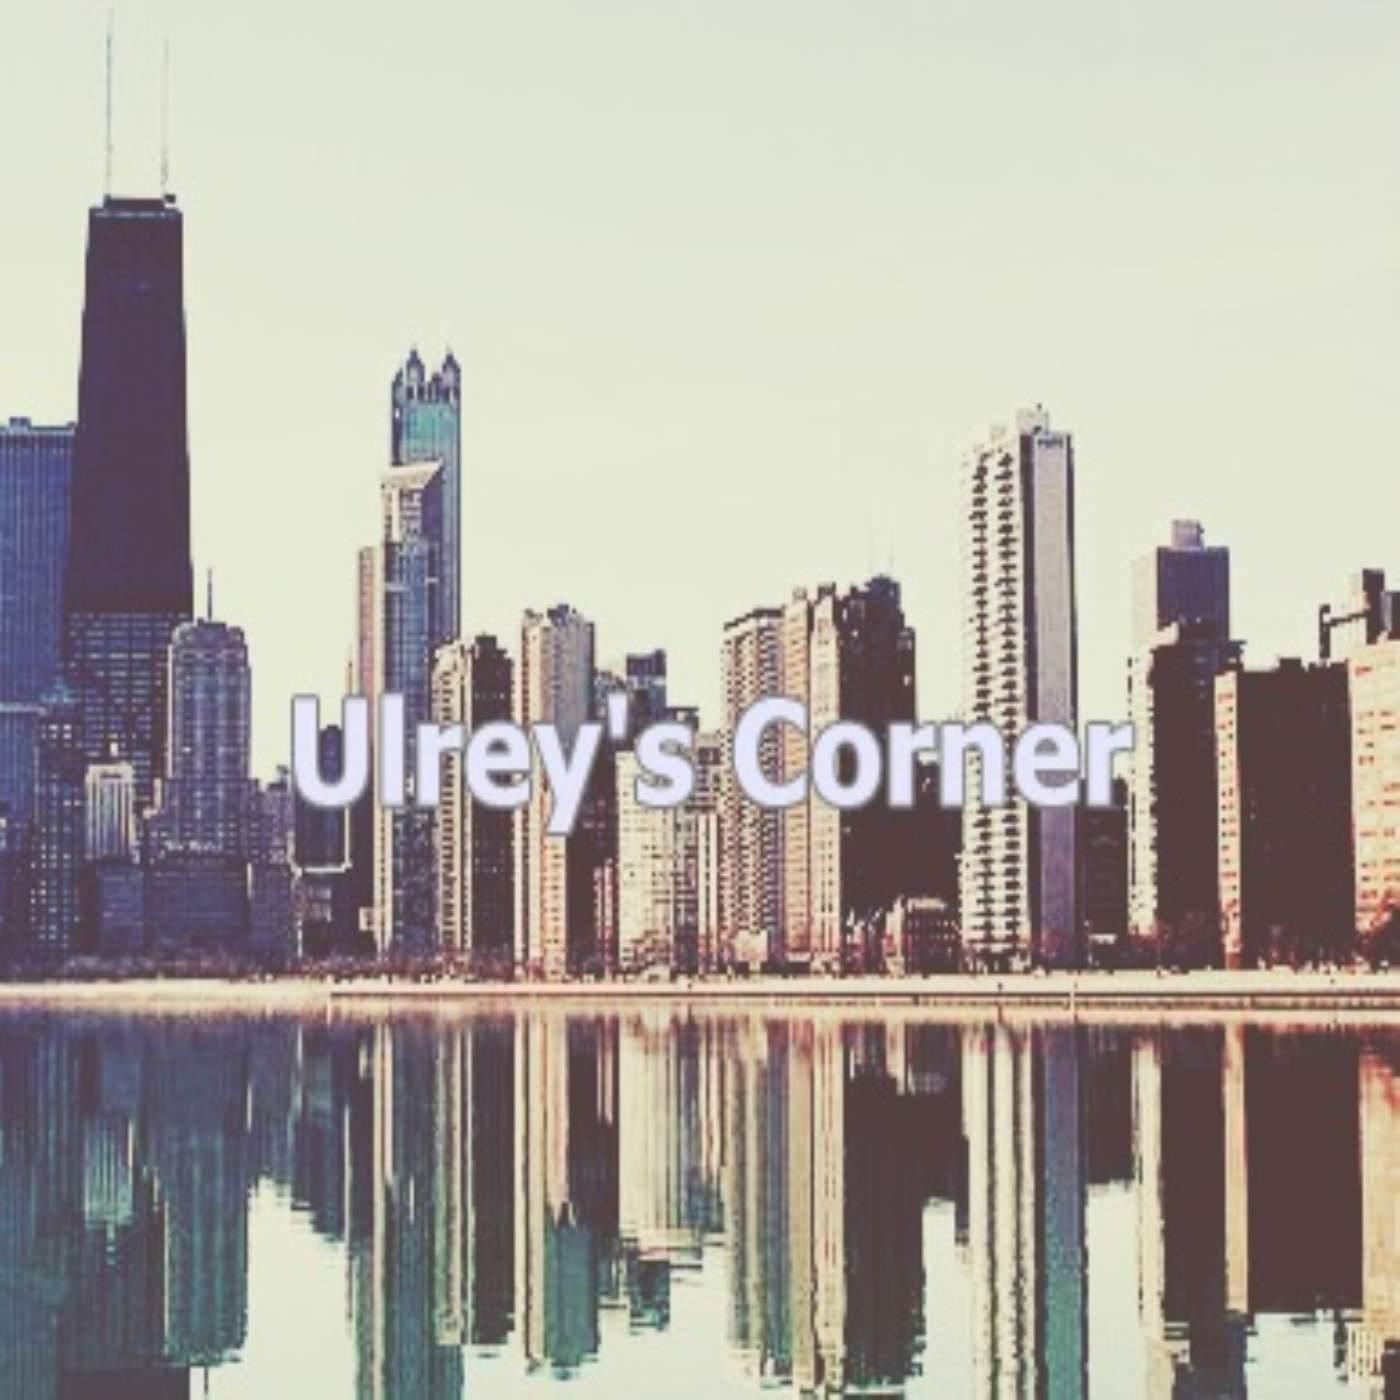 Ulrey'sCorner